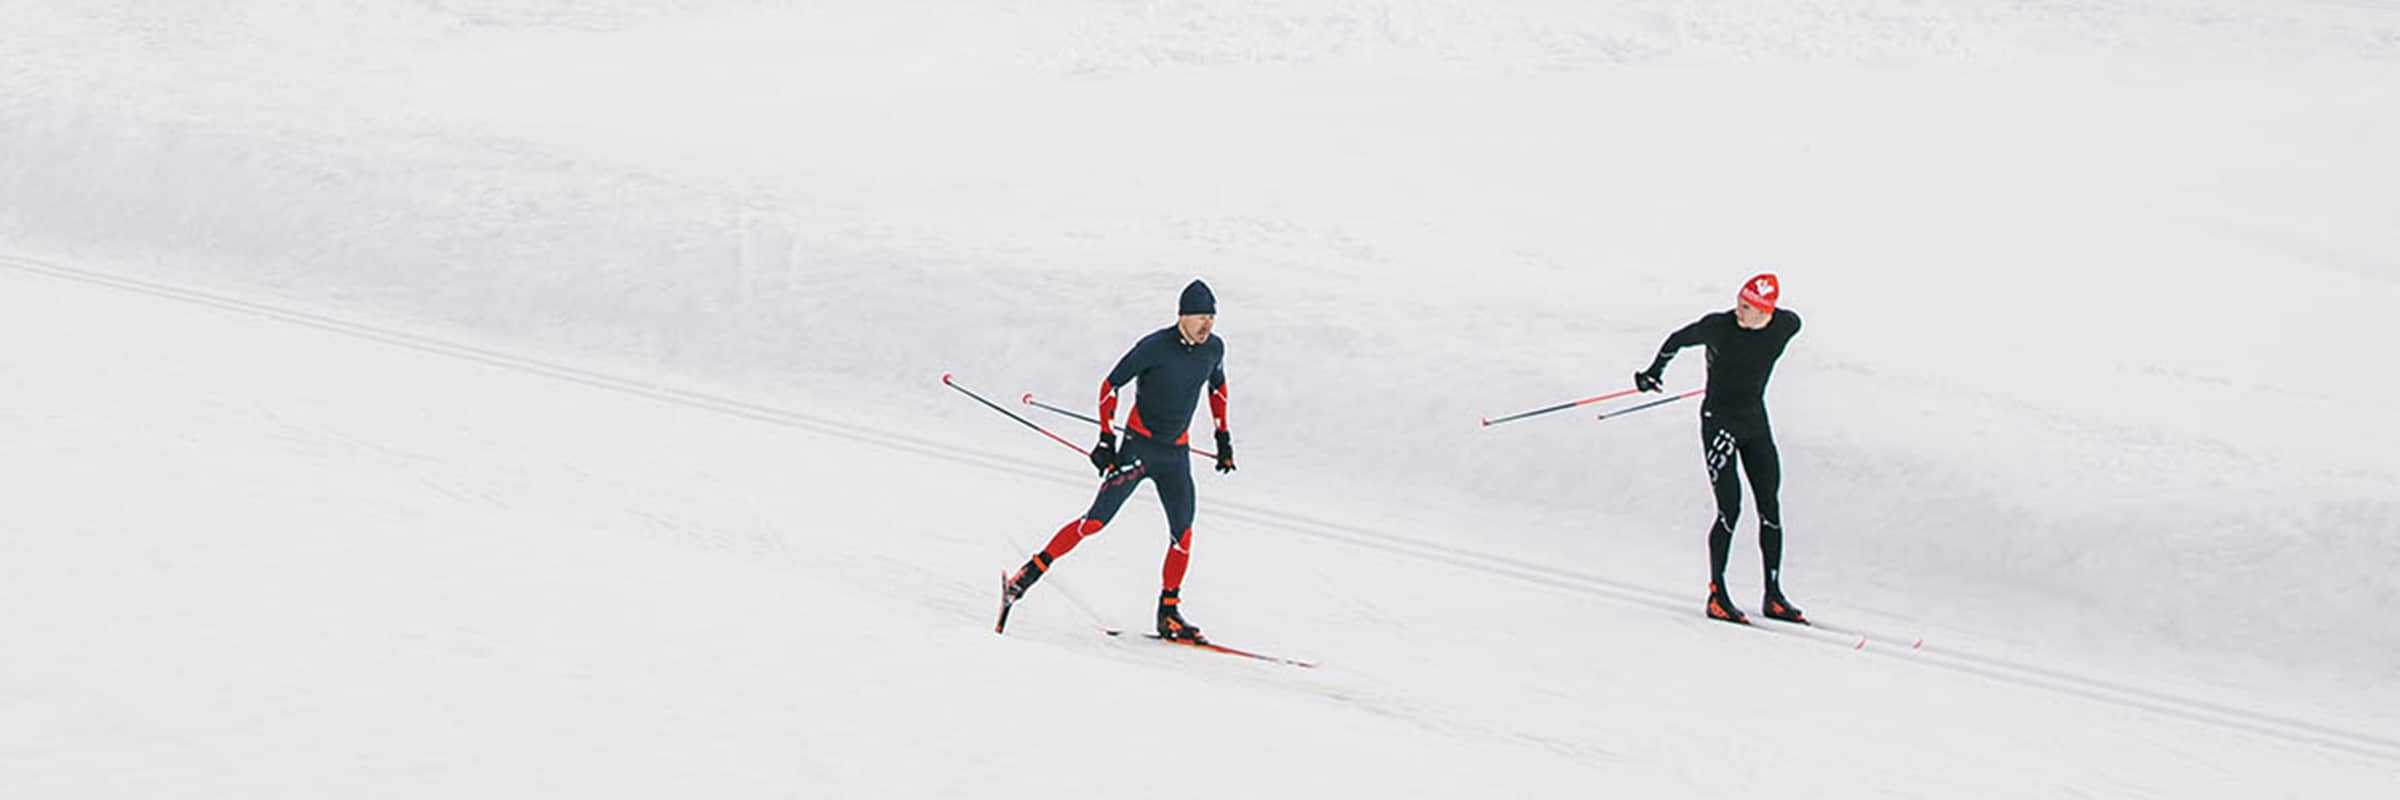 Rossignol. Rossignol: Ski Flair in bleu-blanc-rouge.